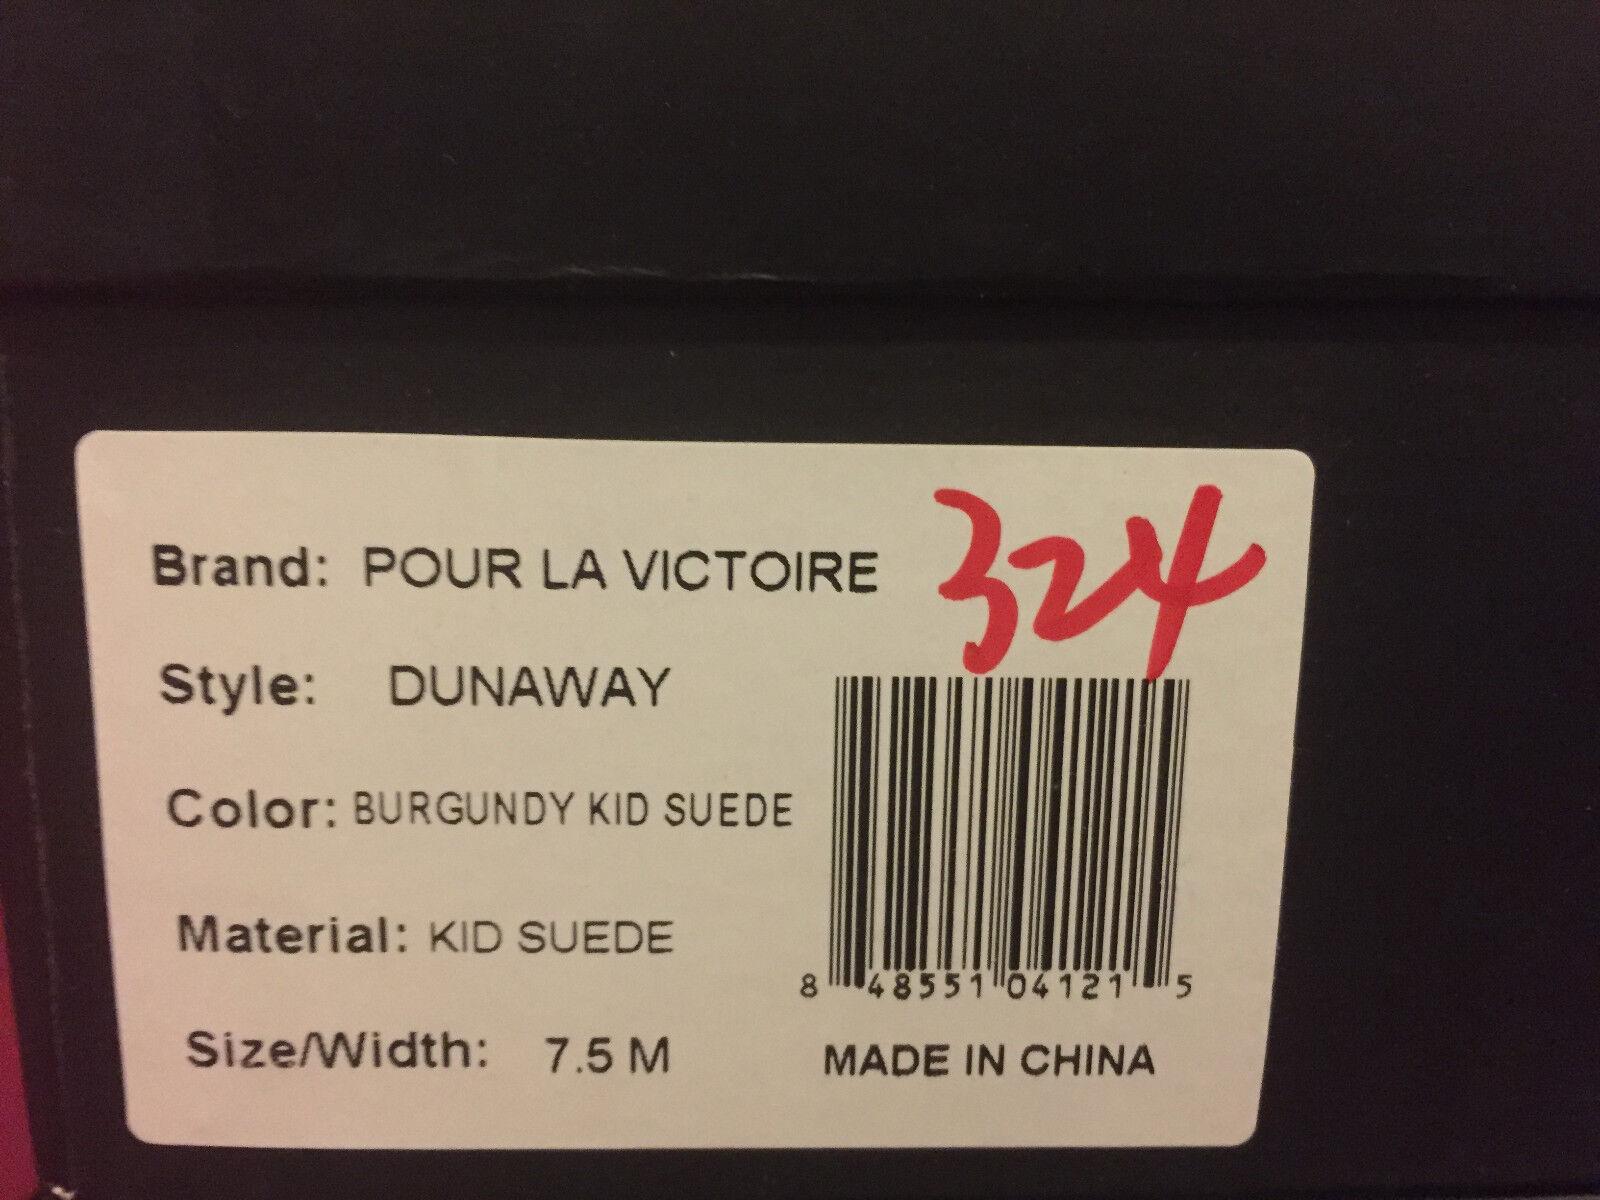 NIB Pour La Victoire Dunaway BURGUNDY KID SUEDE Pump 7.5 7.5 7.5 8 8.5 ea06ae